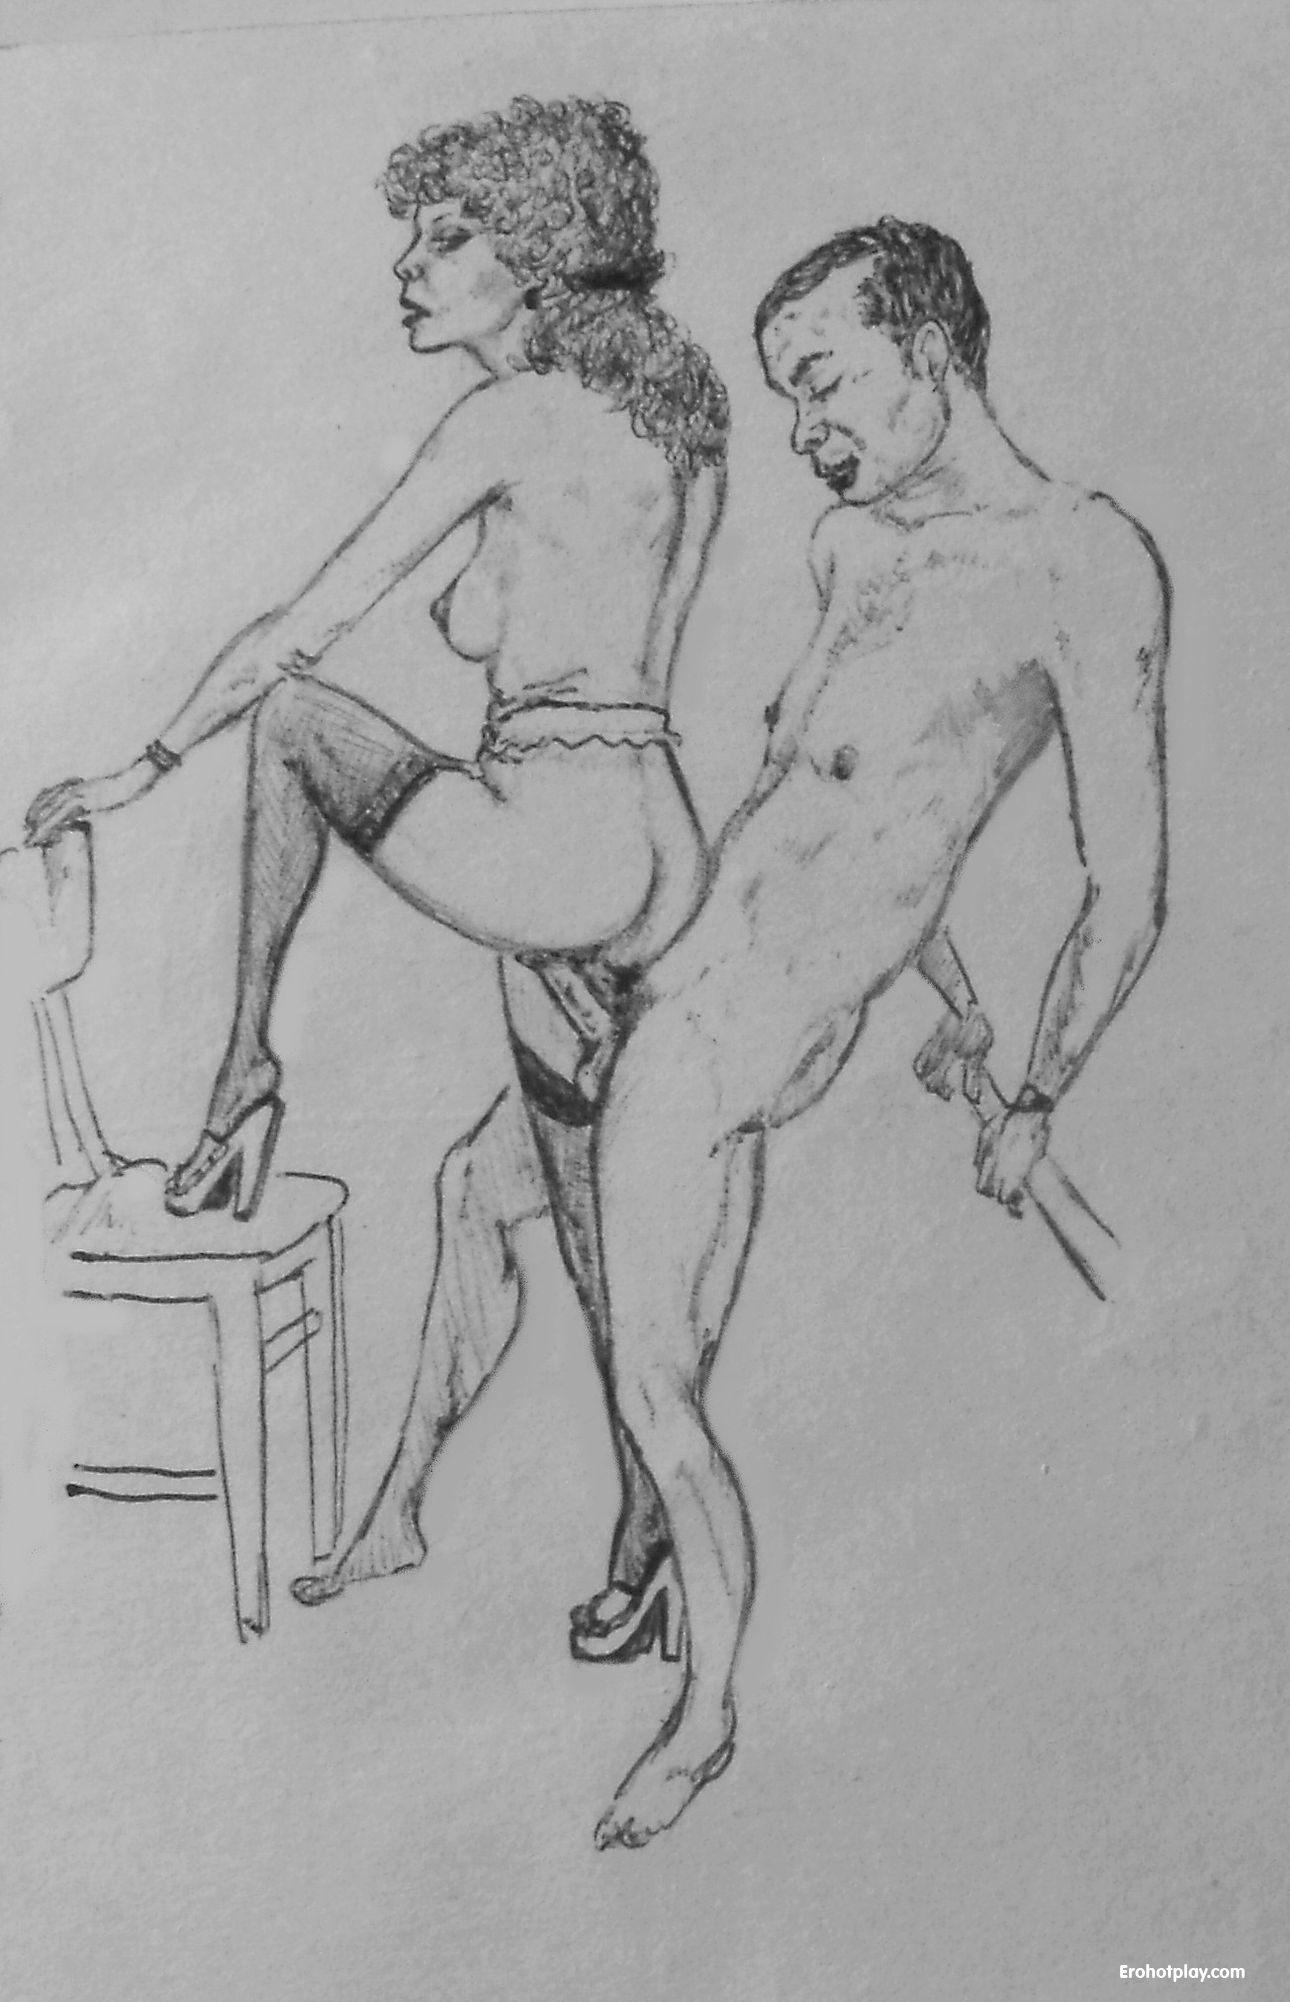 Супер супер порно рисунки карандашом 19 фотография